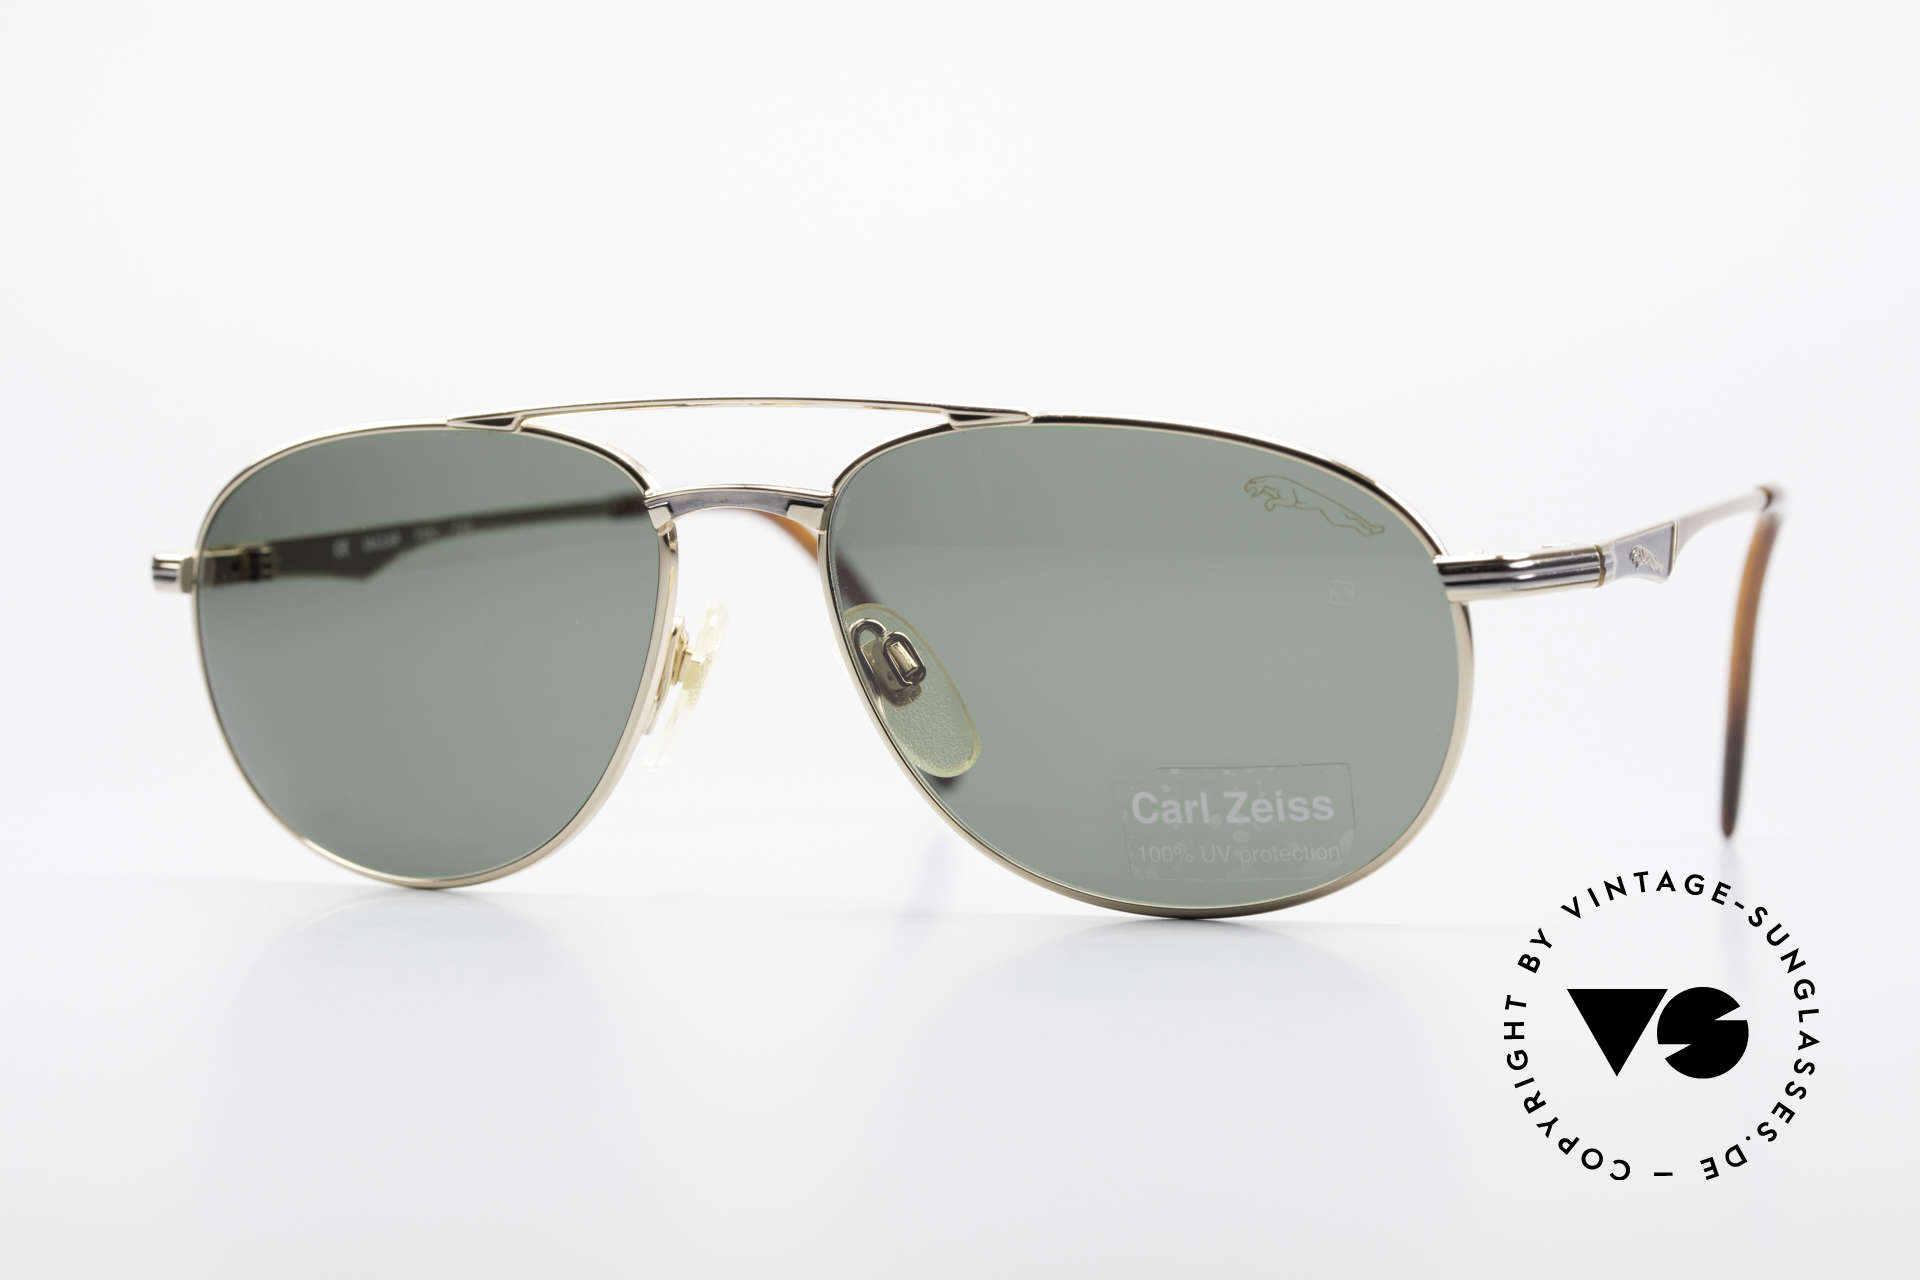 Jaguar 3709 Rare Vintage Sunglasses 90's, rare vintage Jaguar sunglasses from the early 1990s, Made for Men